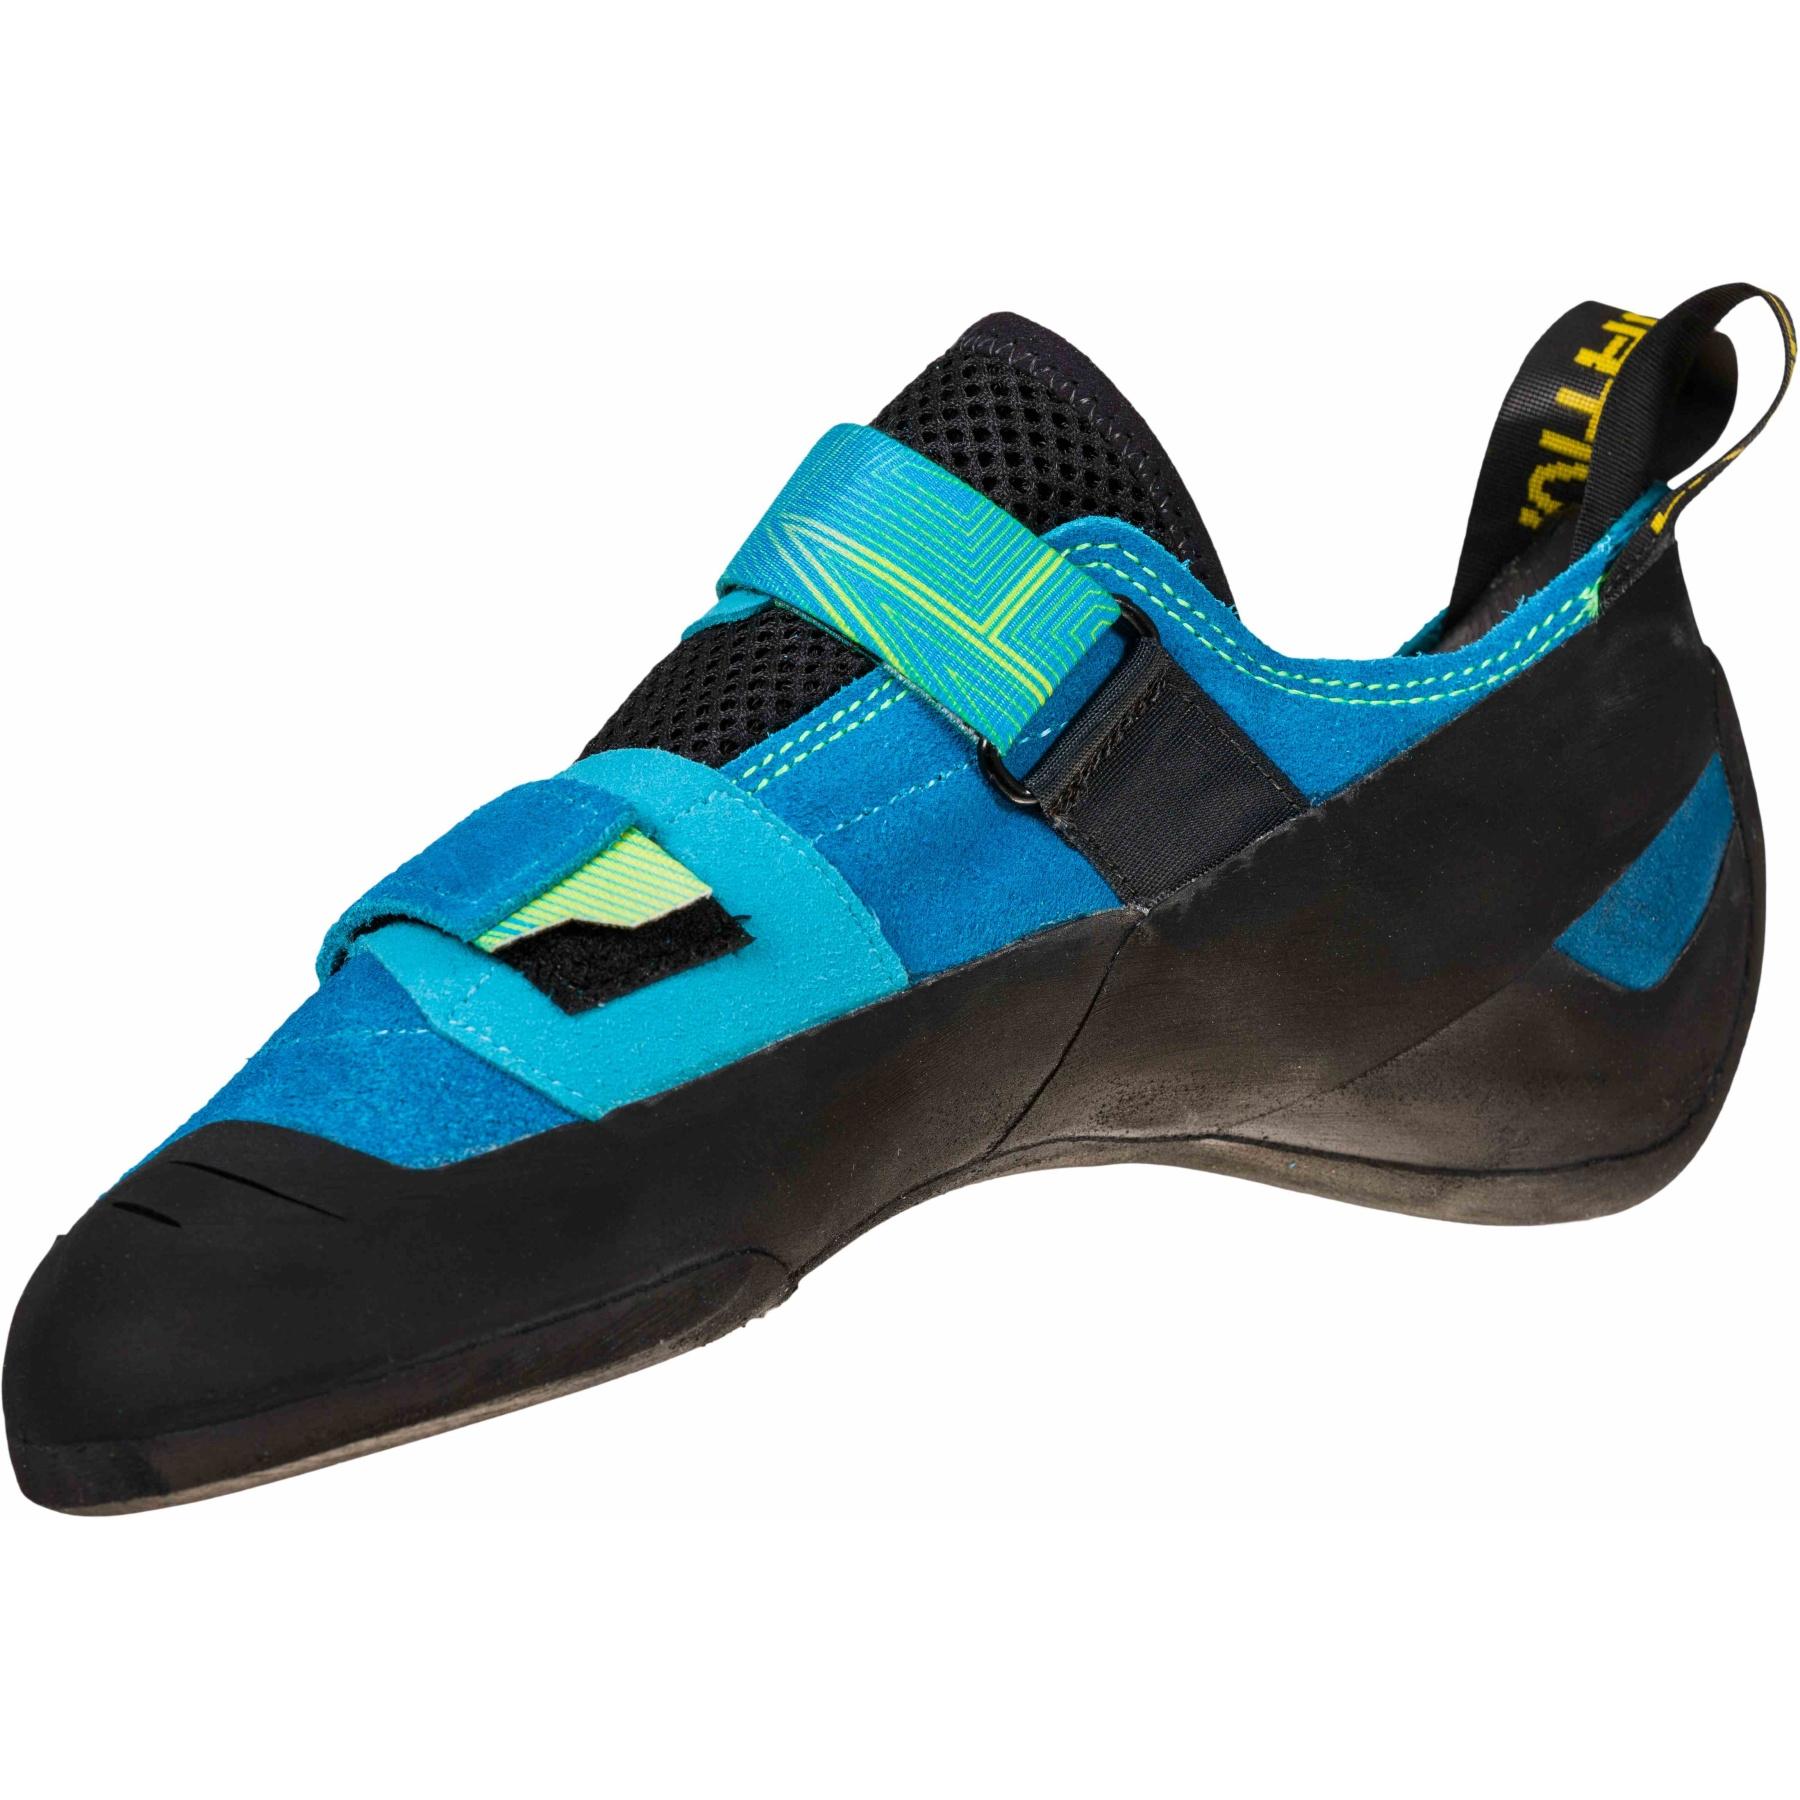 Image of La Sportiva Aragon Climbing Shoes - Neptune/Citrus